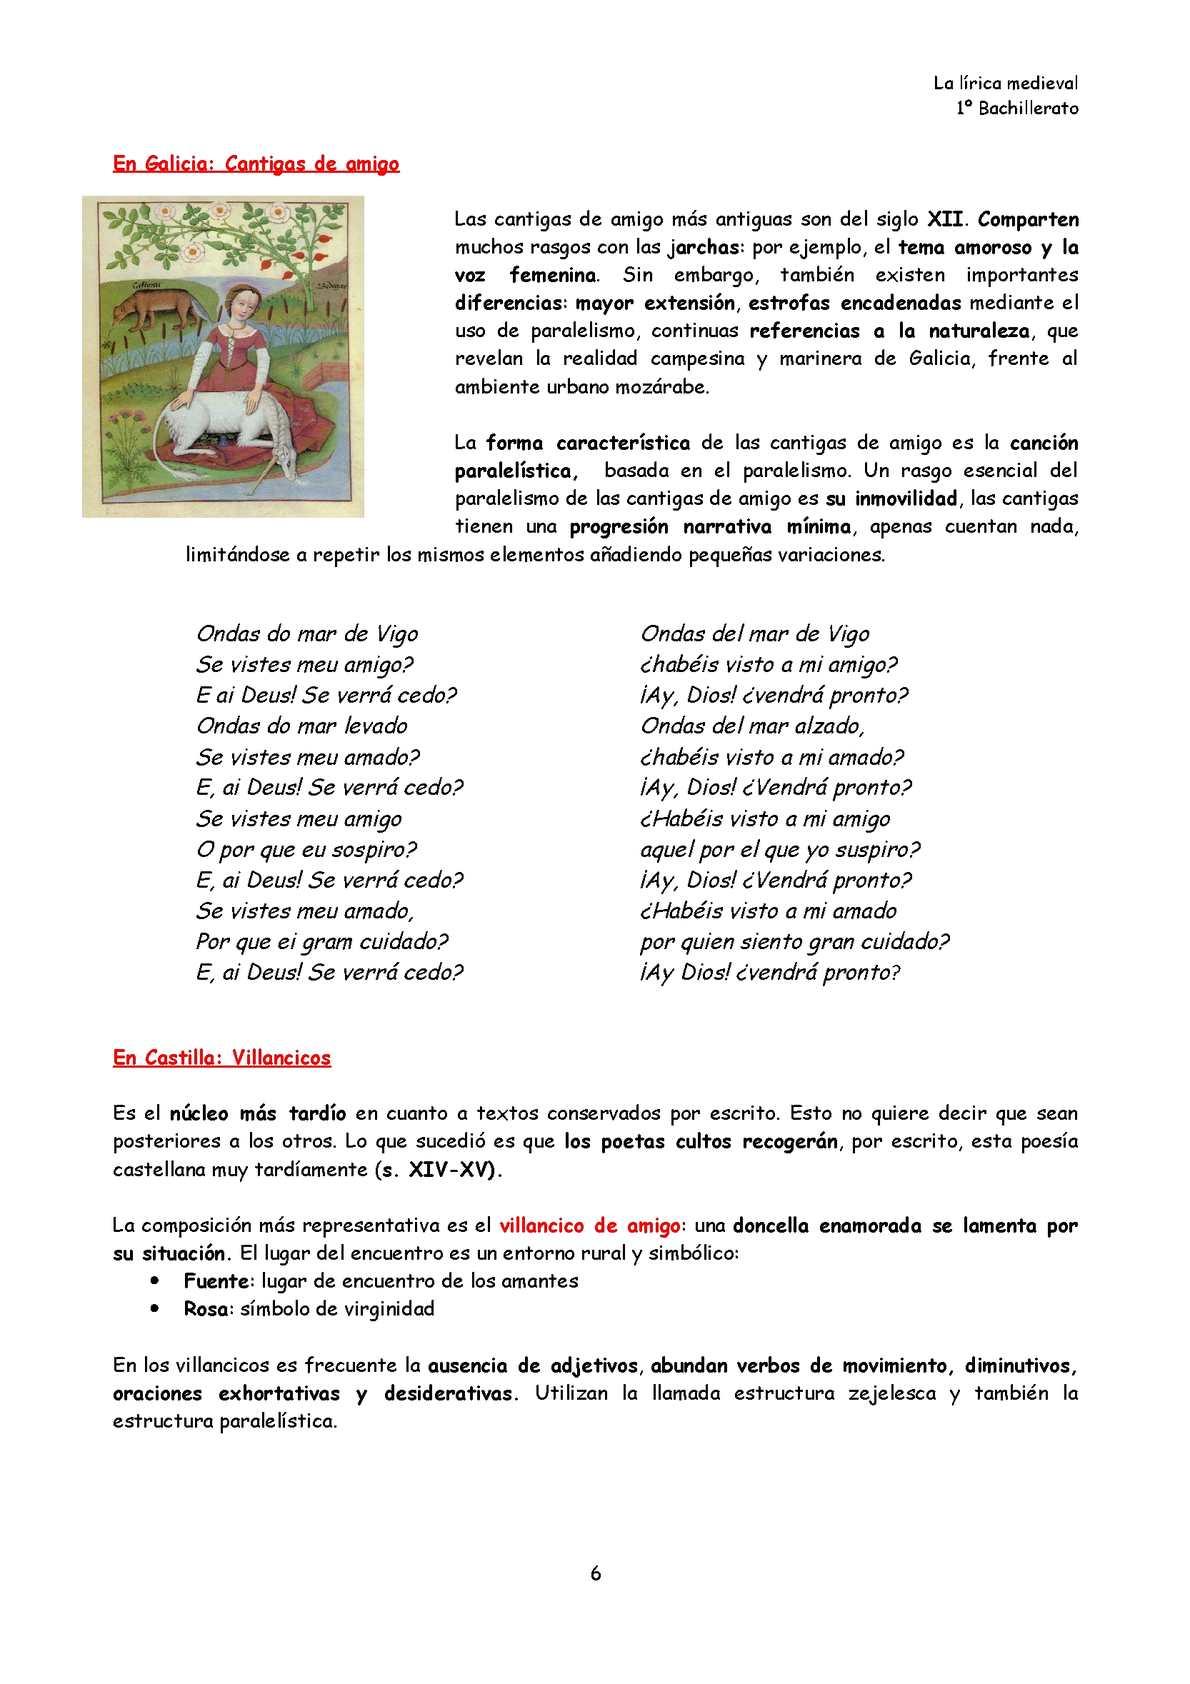 Lírica Medieval Calameo Downloader